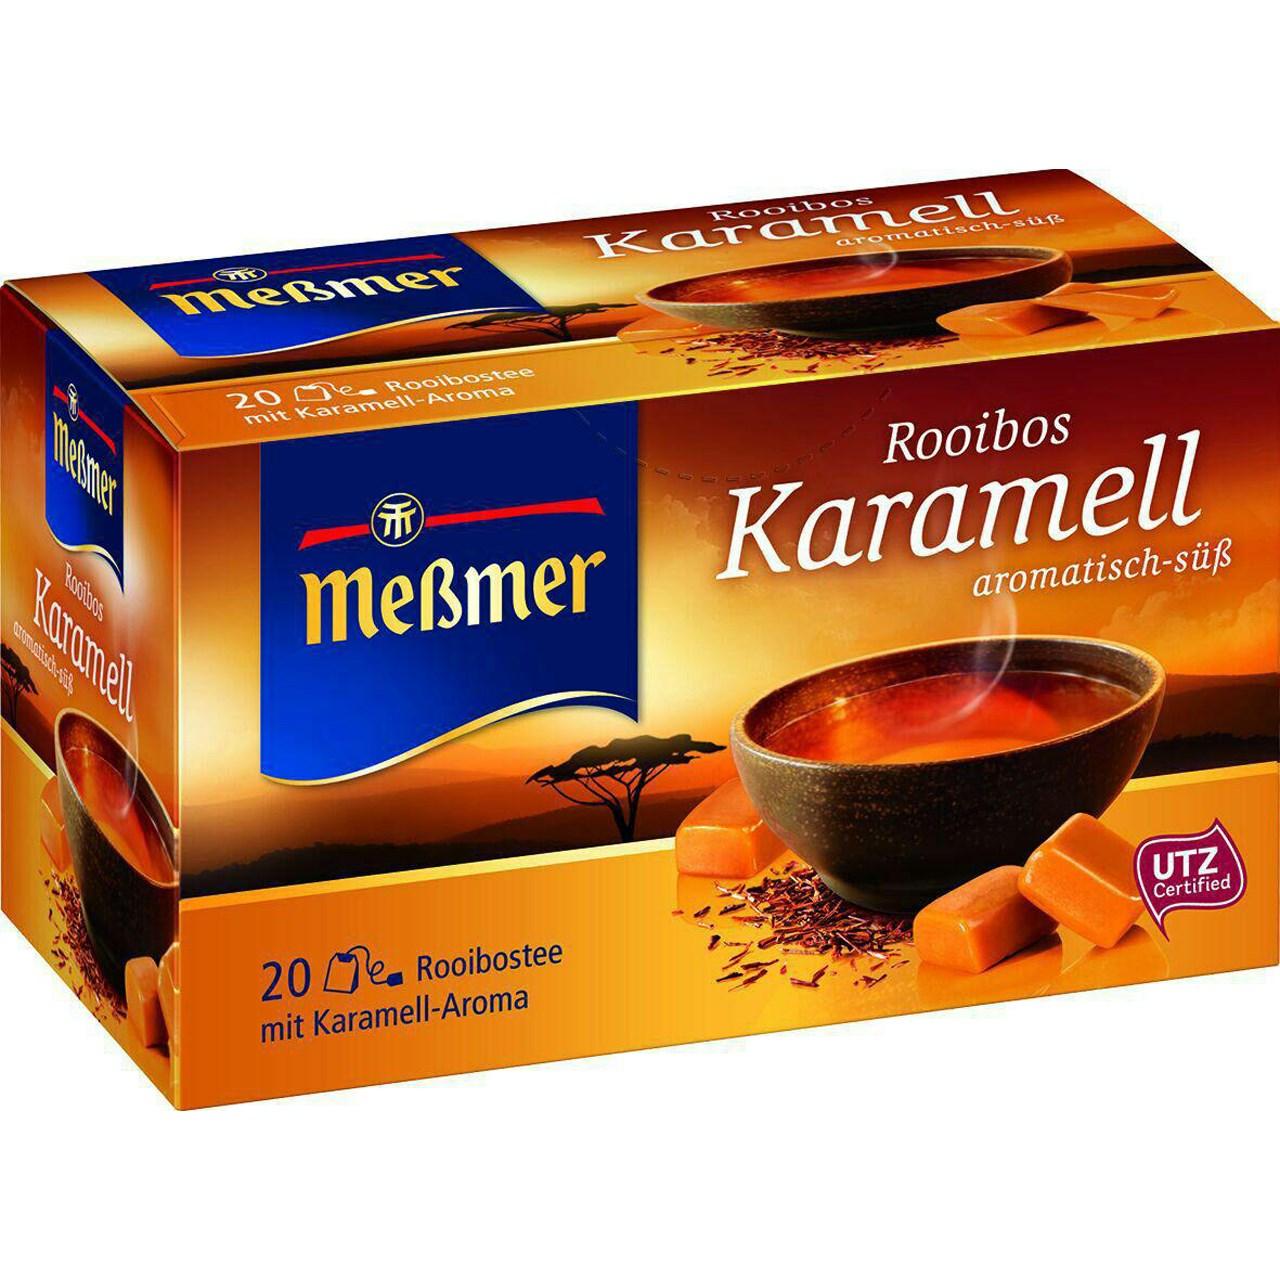 بسته دمنوش گیاهی مسمر مدل Rooibos Karamell aromatisch - sub